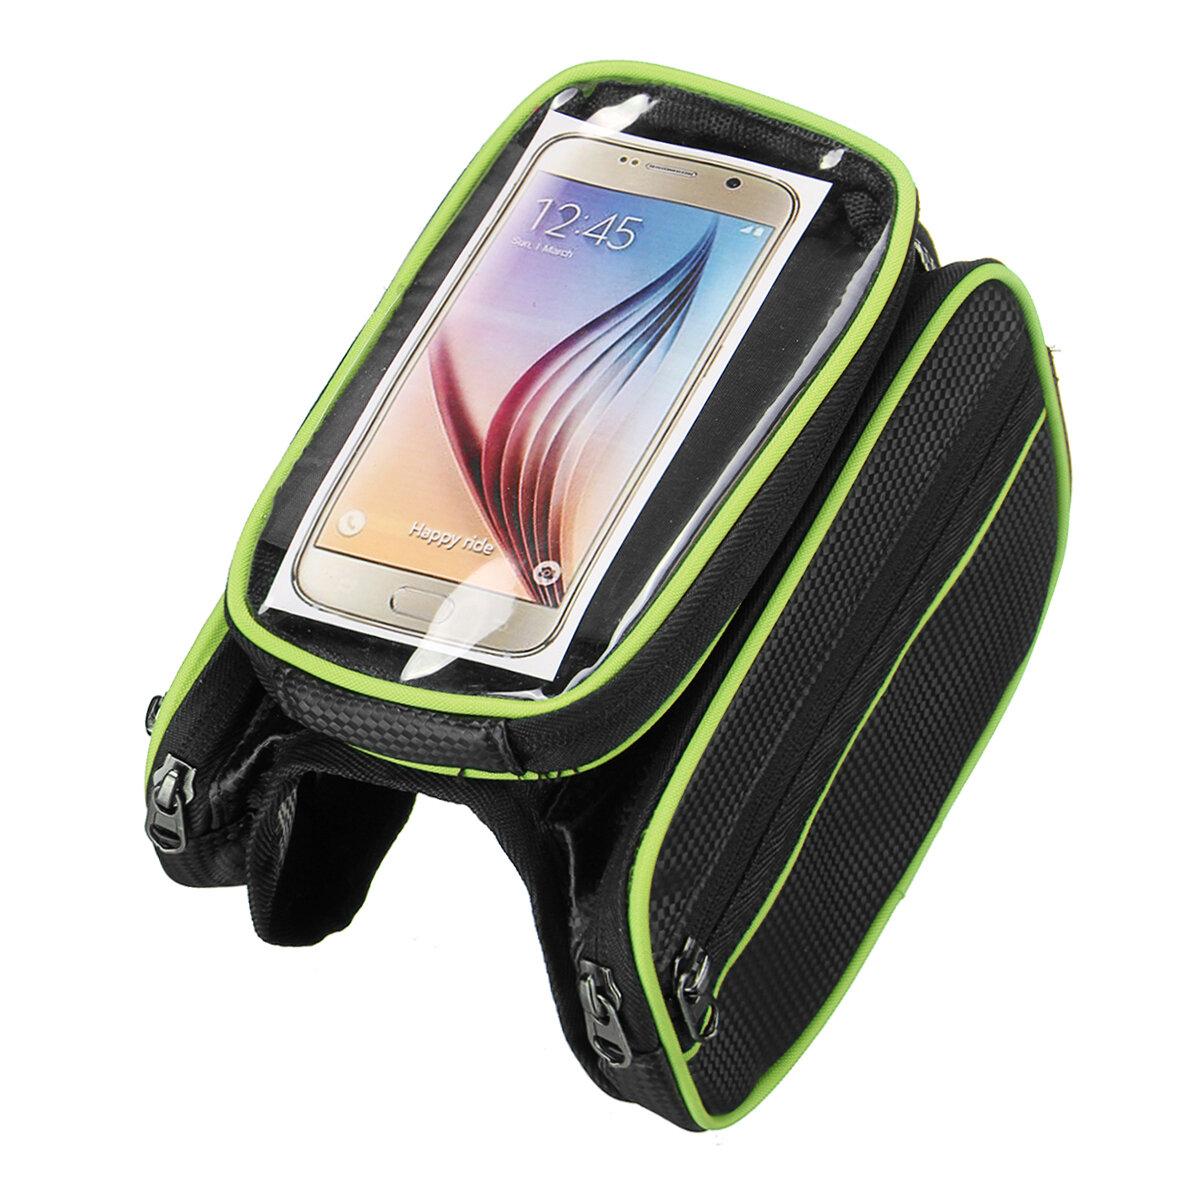 BIKIGHTBiciperbiciclettaanterioretelaio tubo Phone Borsa Touch Screen impermeabile doppio sacchetto ciclismo Borsa - 4